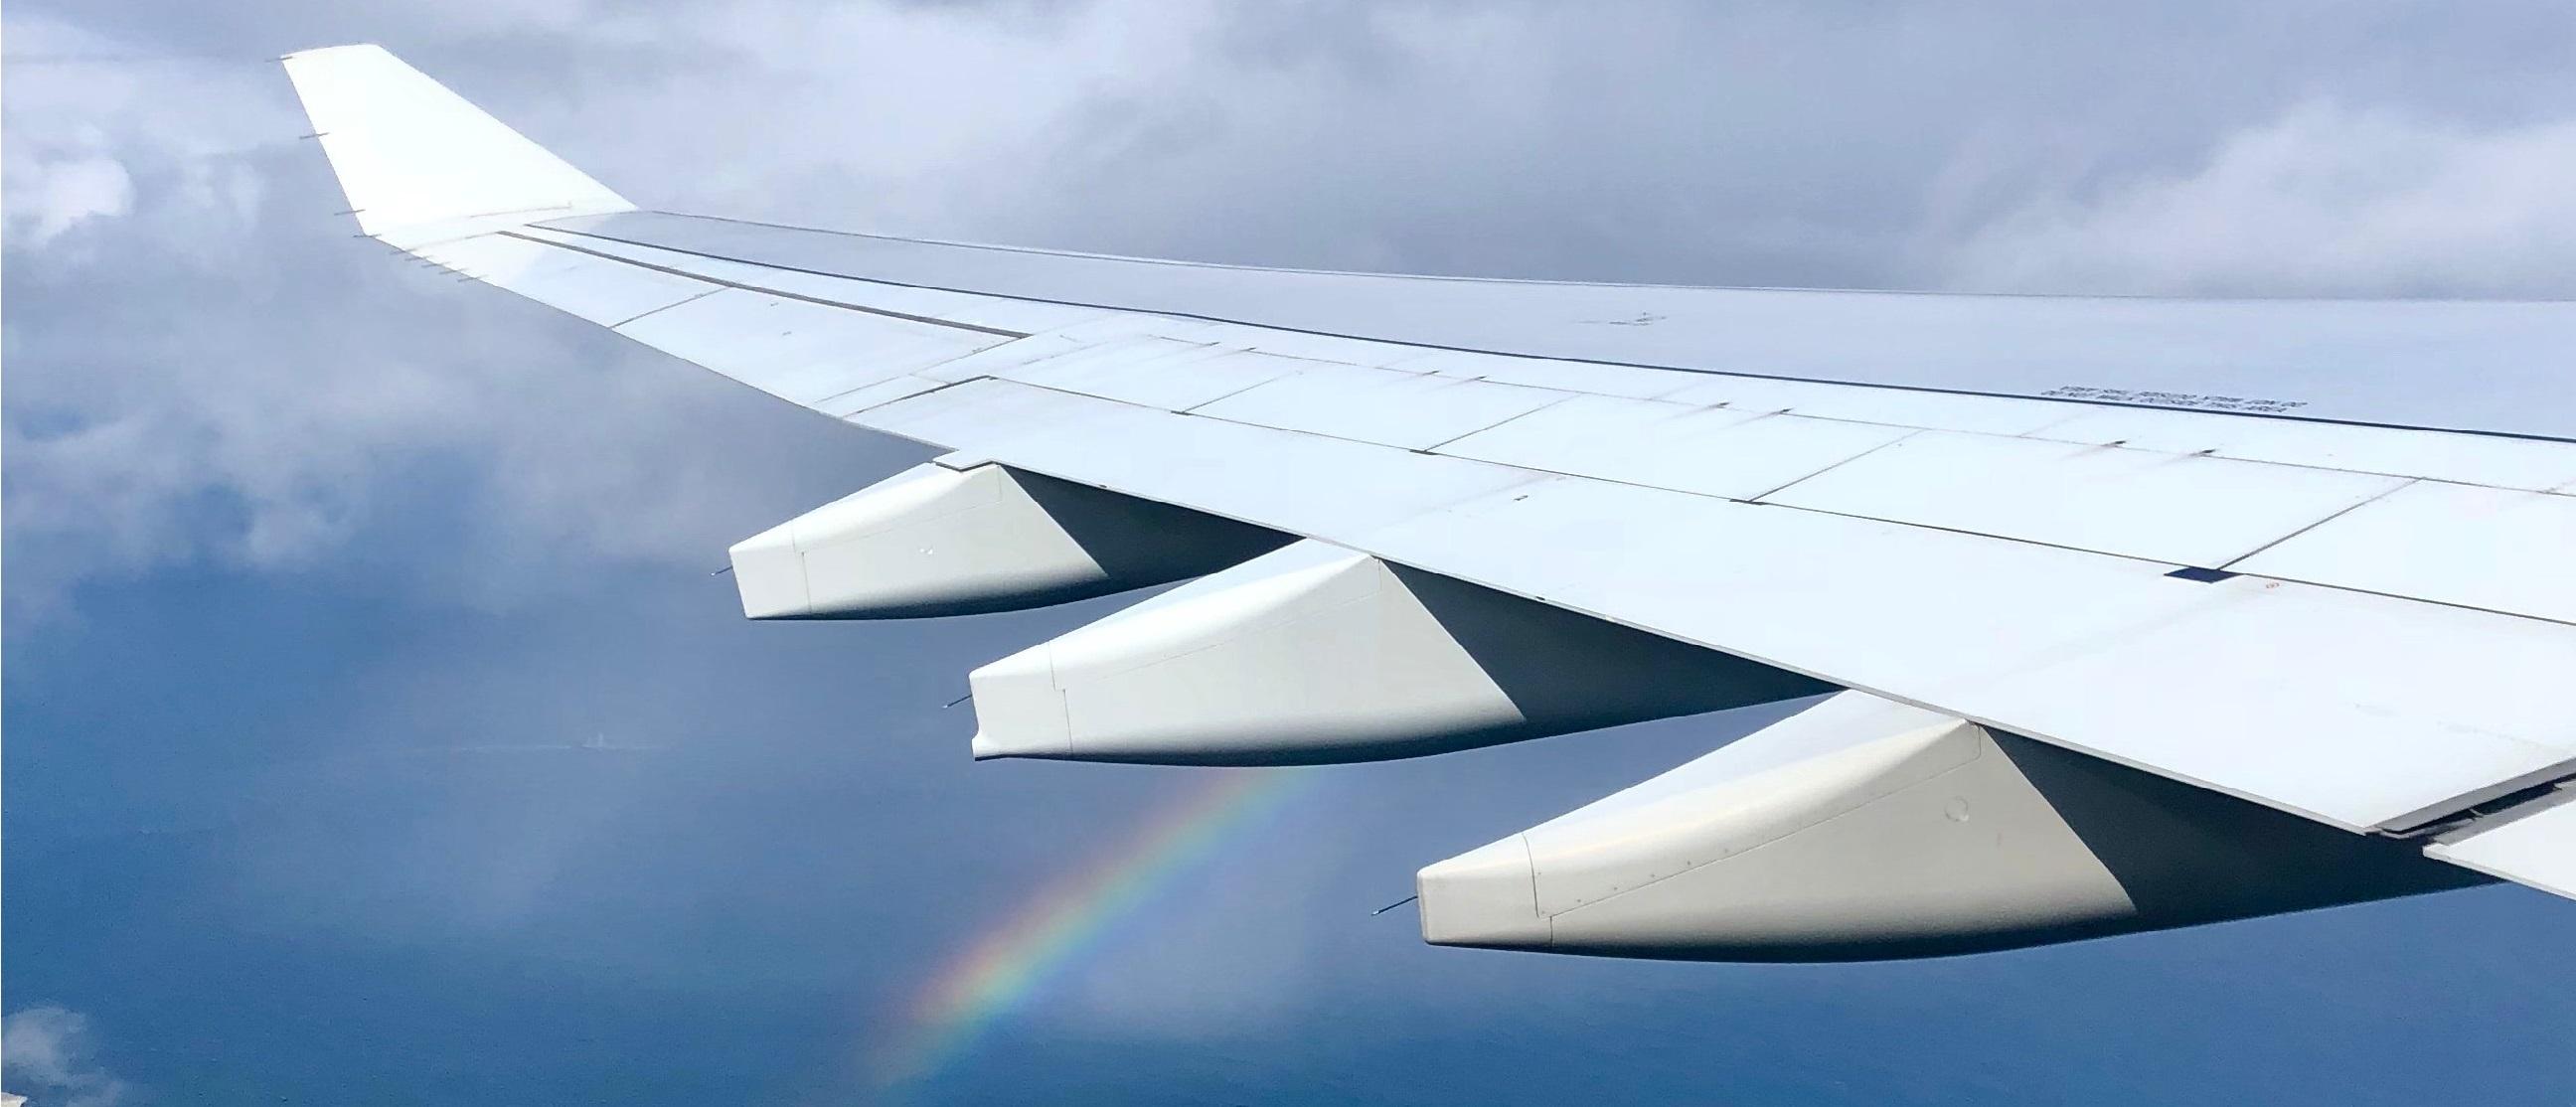 aerial-photography-aerial-shot-aeroplane-1655985